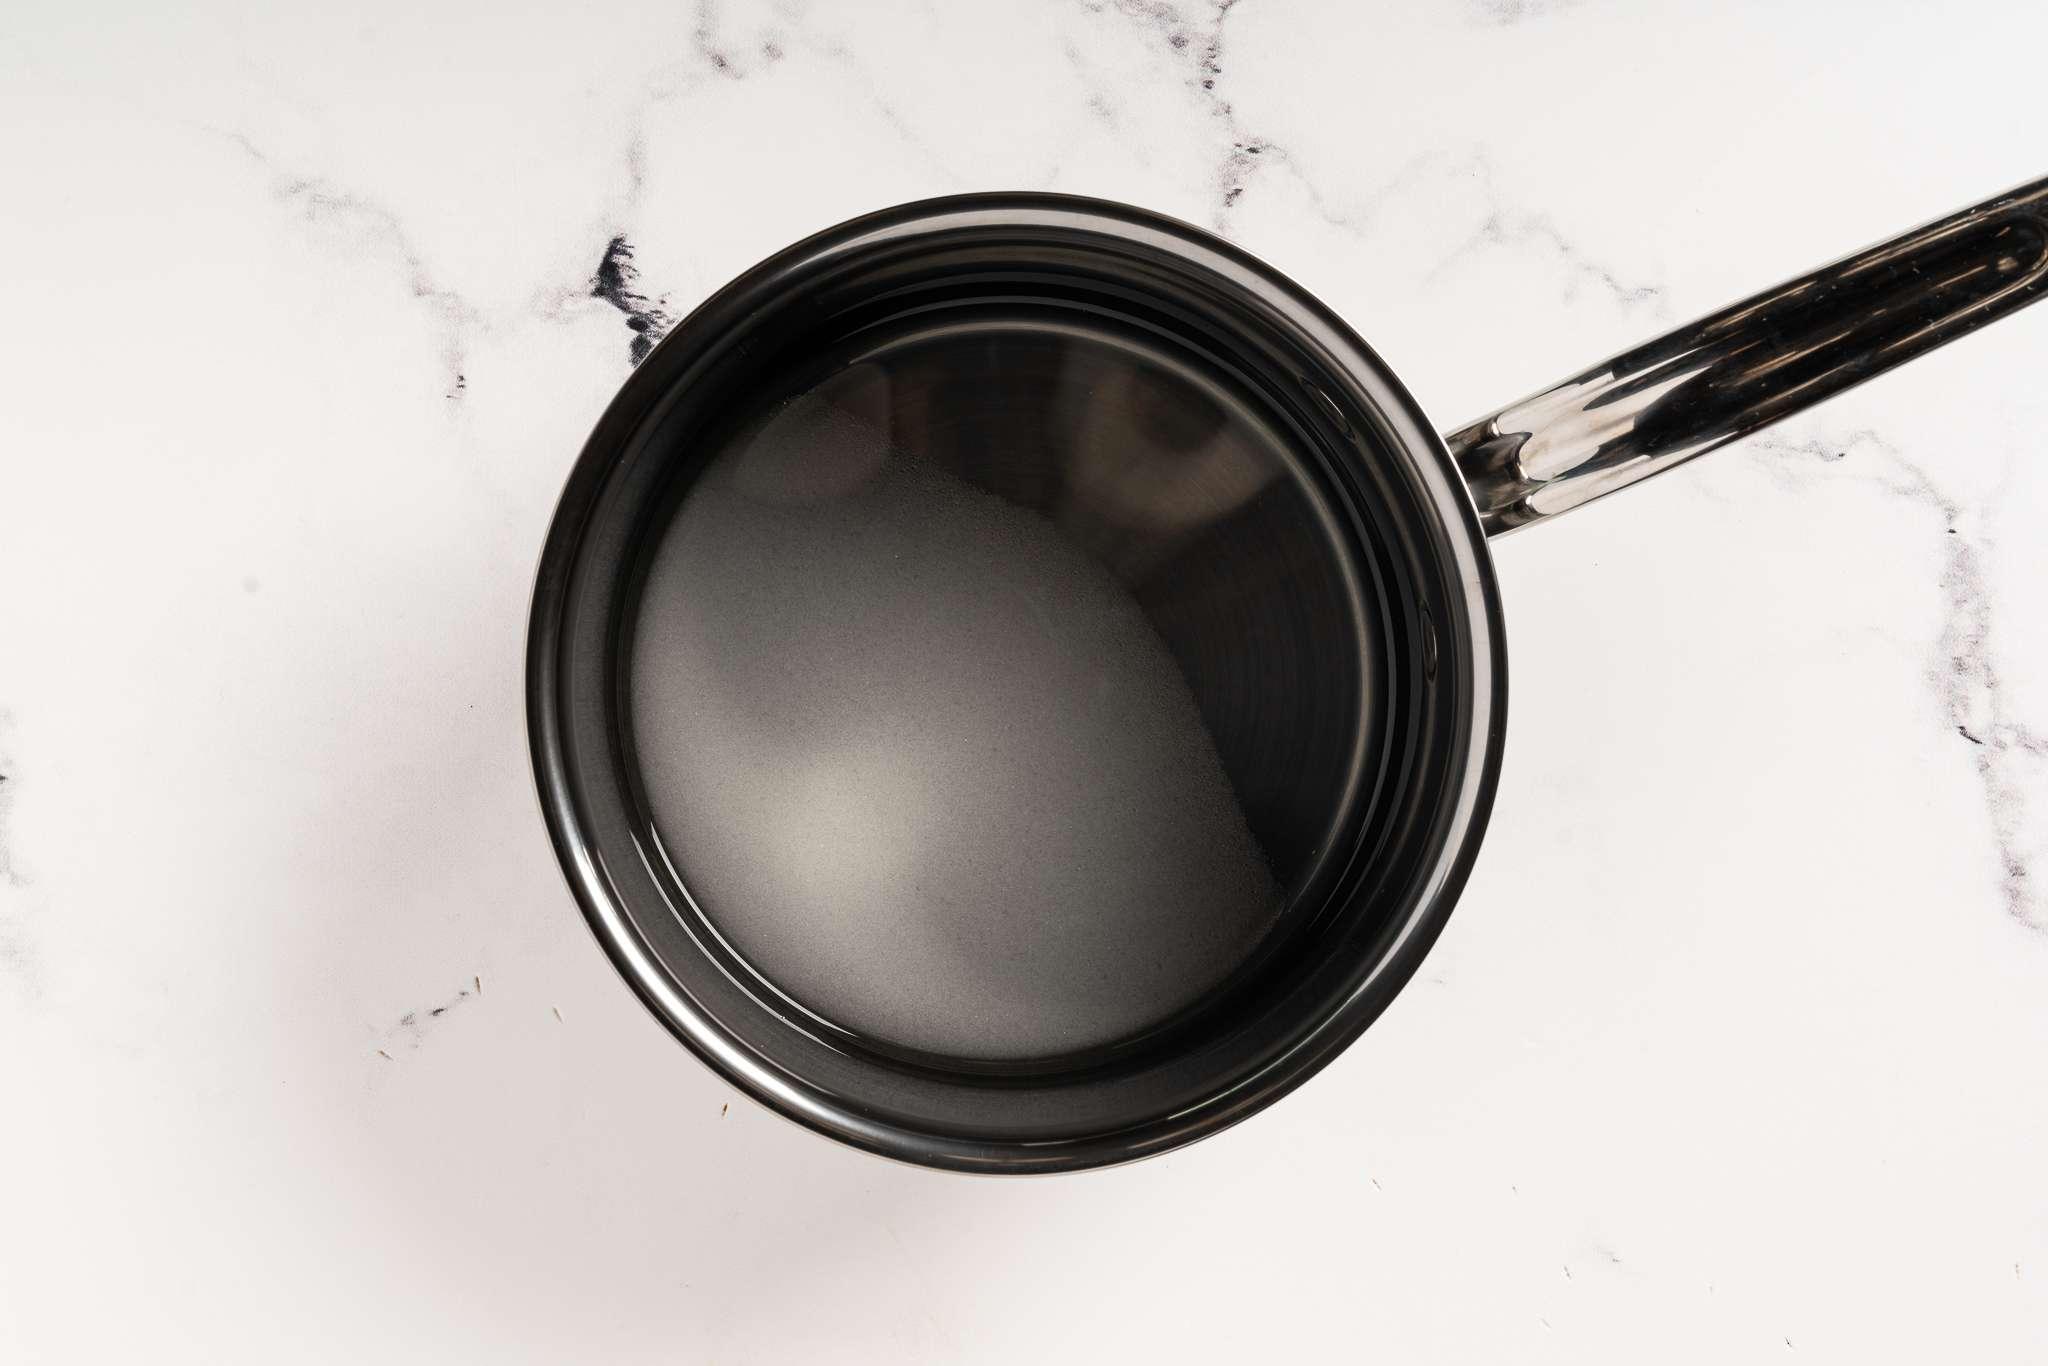 Sugar syrup in a pot